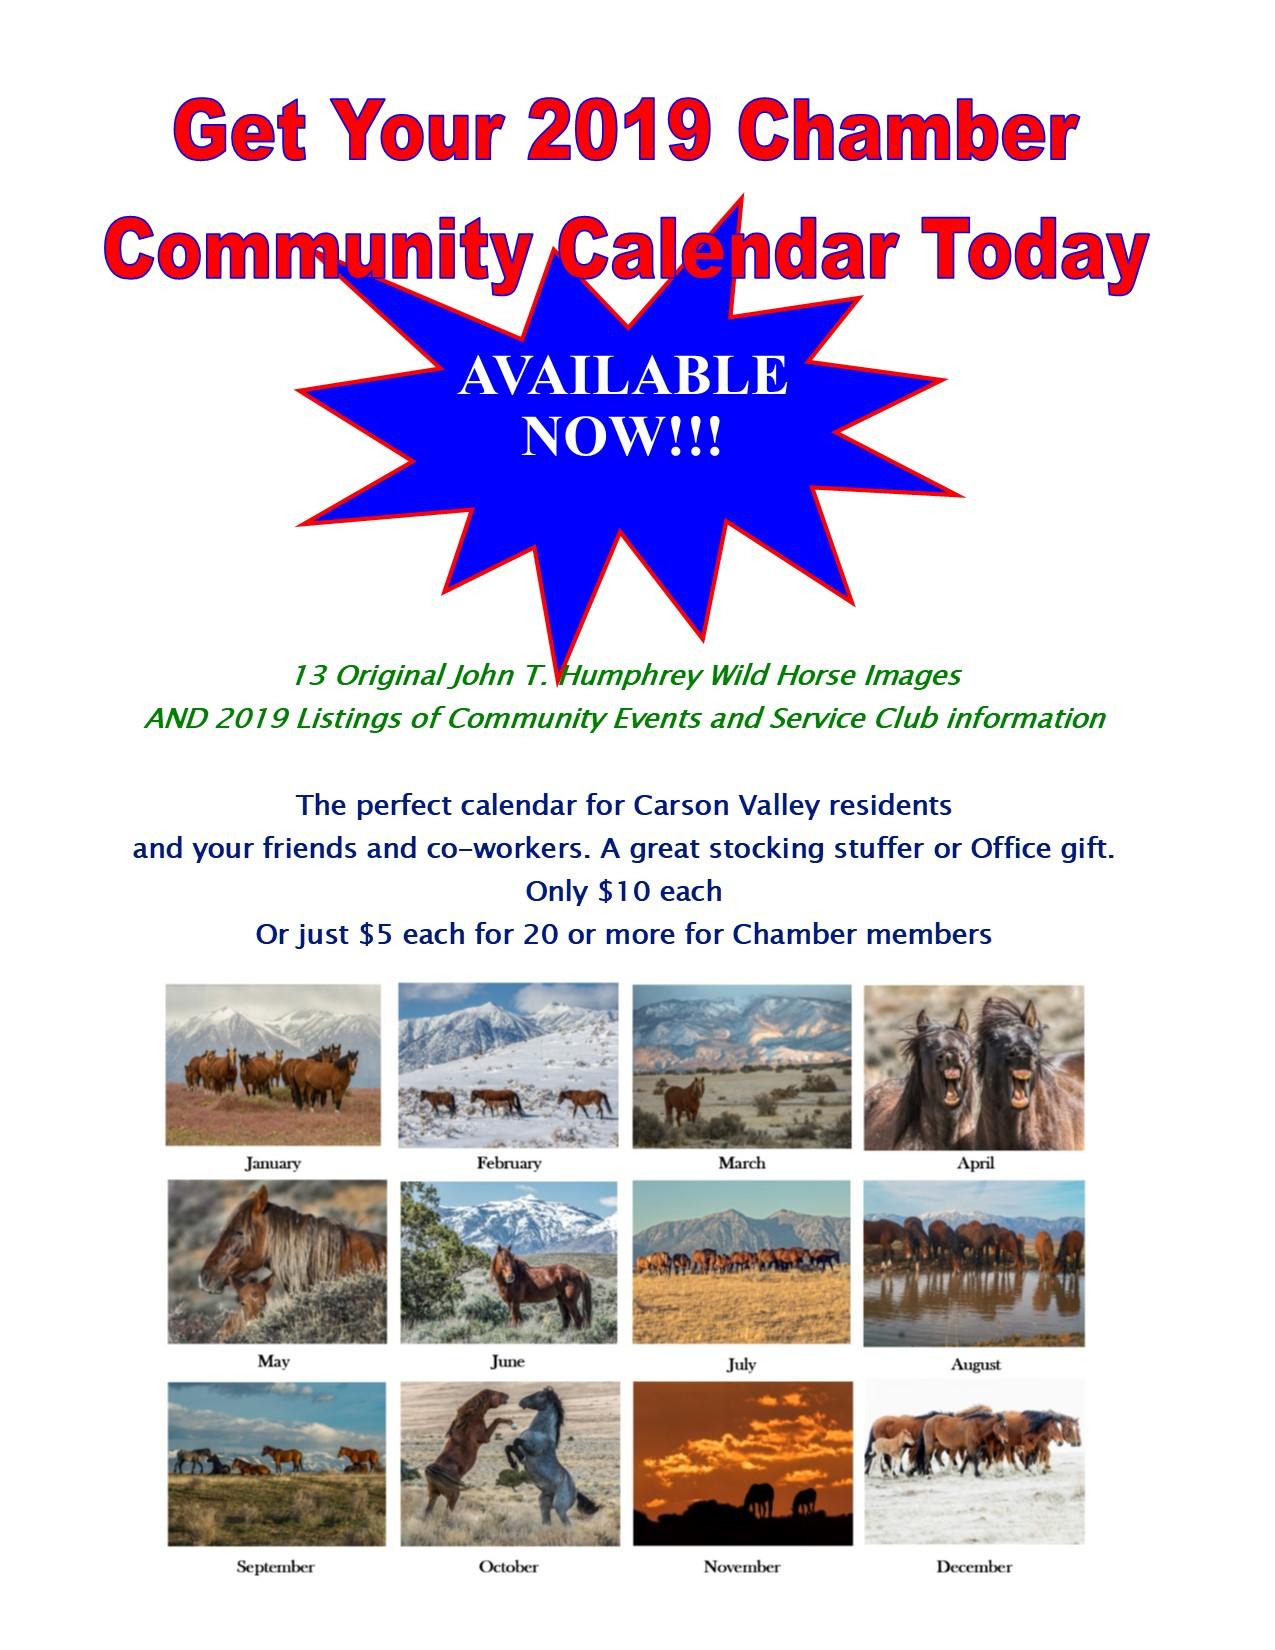 Calendar-Flyer-Avail-Now.jpg